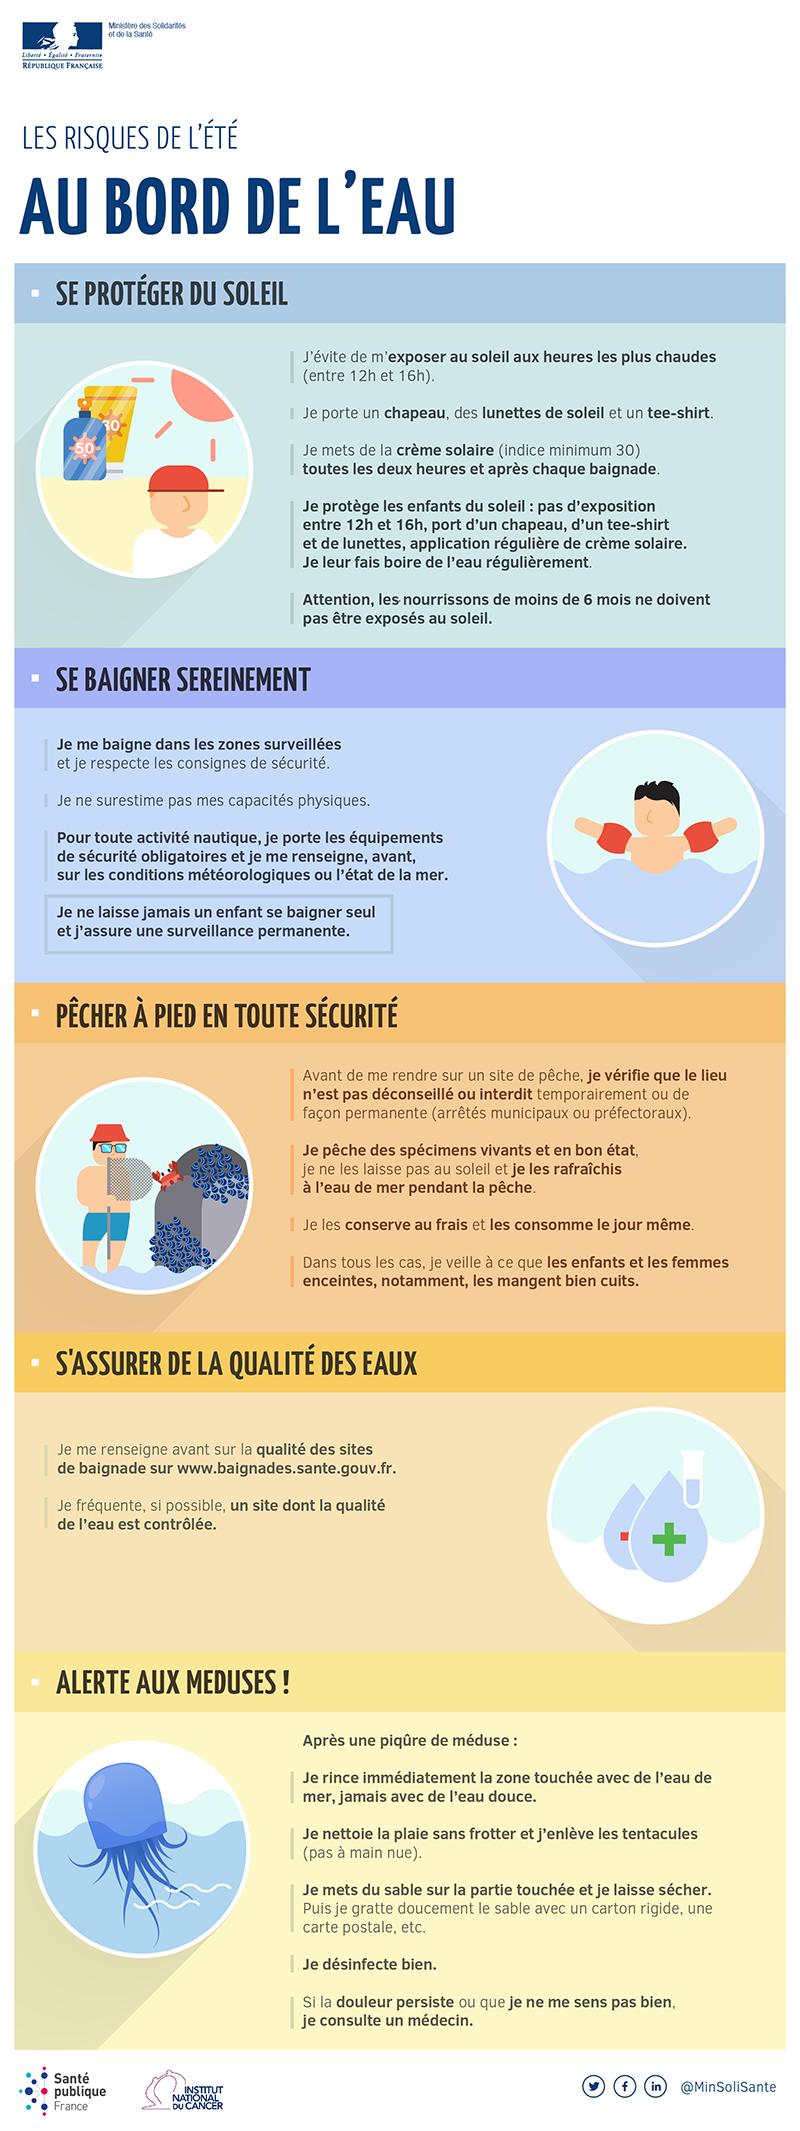 infog_auborddeleau2